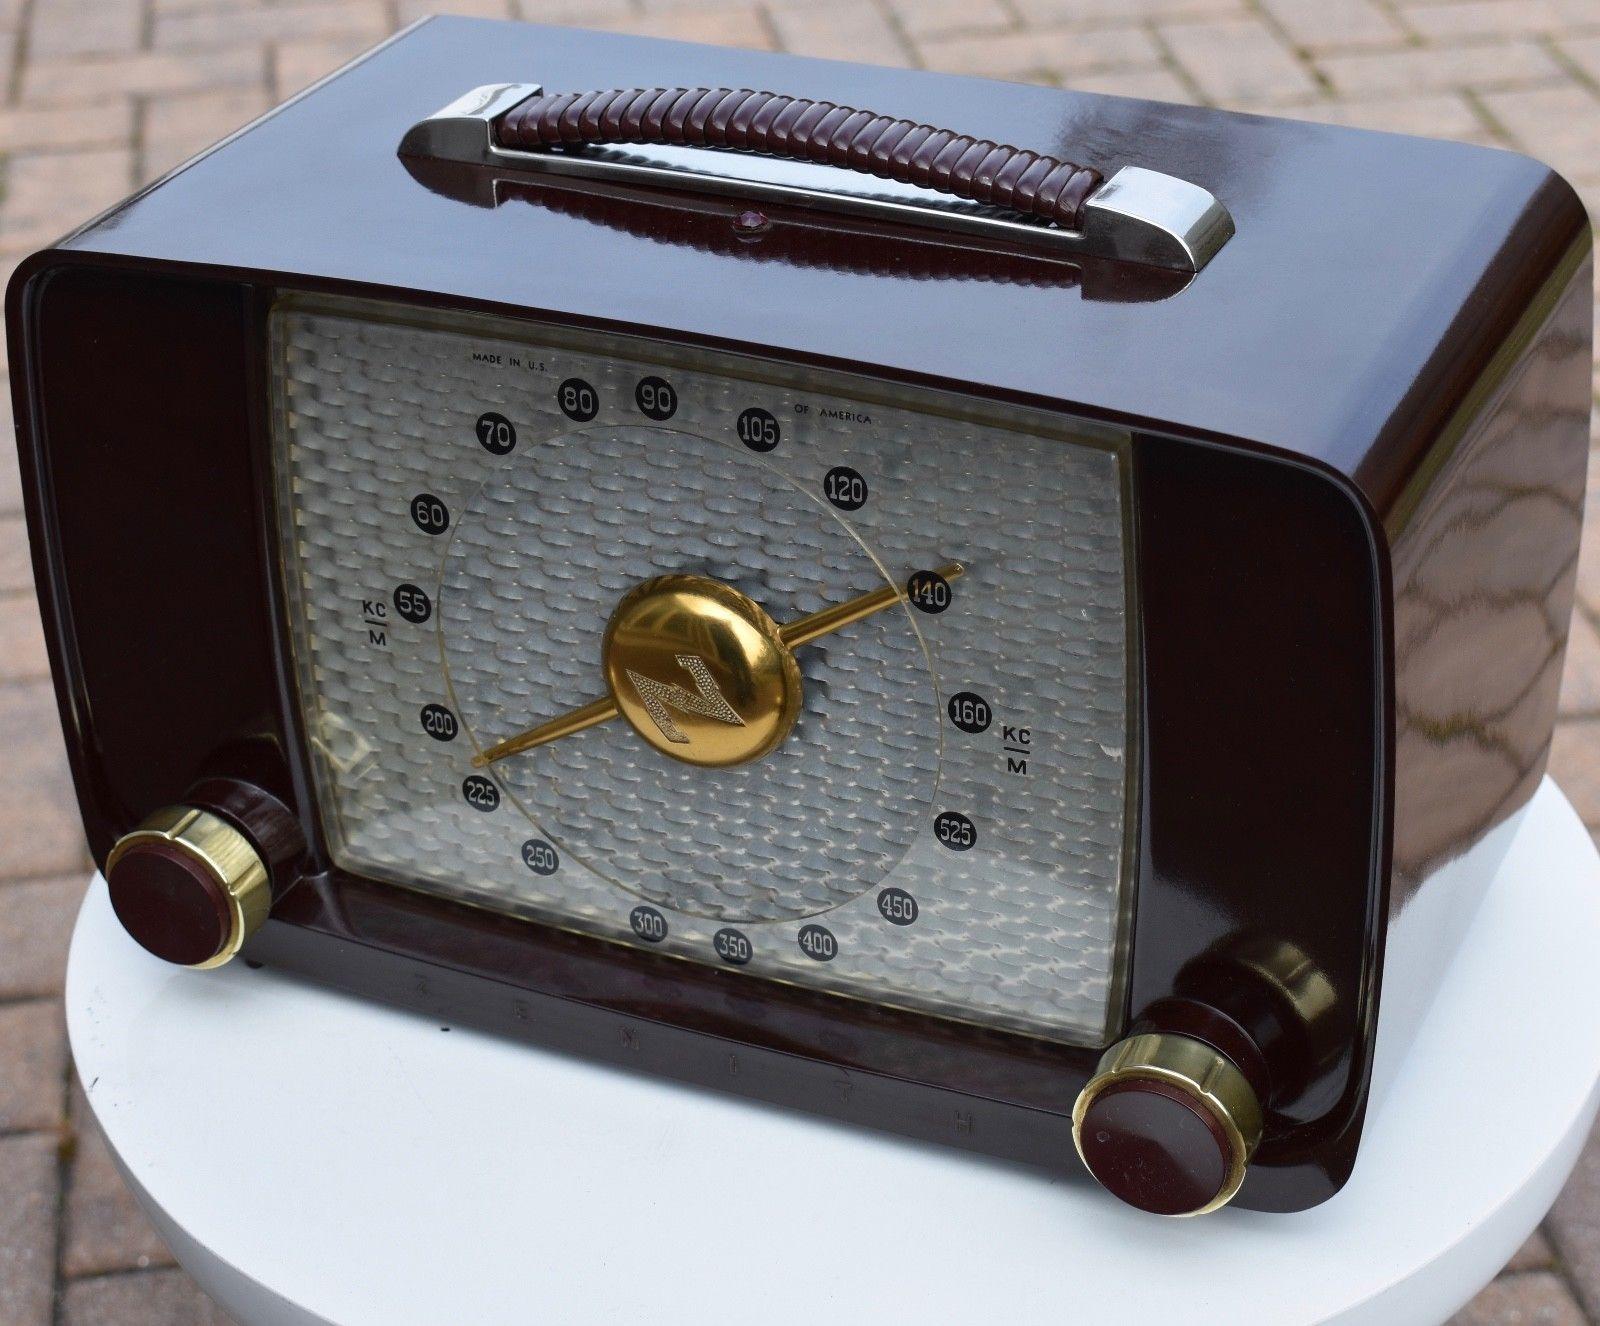 Zenith Mid Century 6 Tube Radio Orig Box Manual Plays Well In 2018. Zenith 6d815 Mid Century 6 Tube Radio Orig Box Manual Plays Well Ebay. Wiring. 1920s Zenith Tube Radio Schematics At Scoala.co